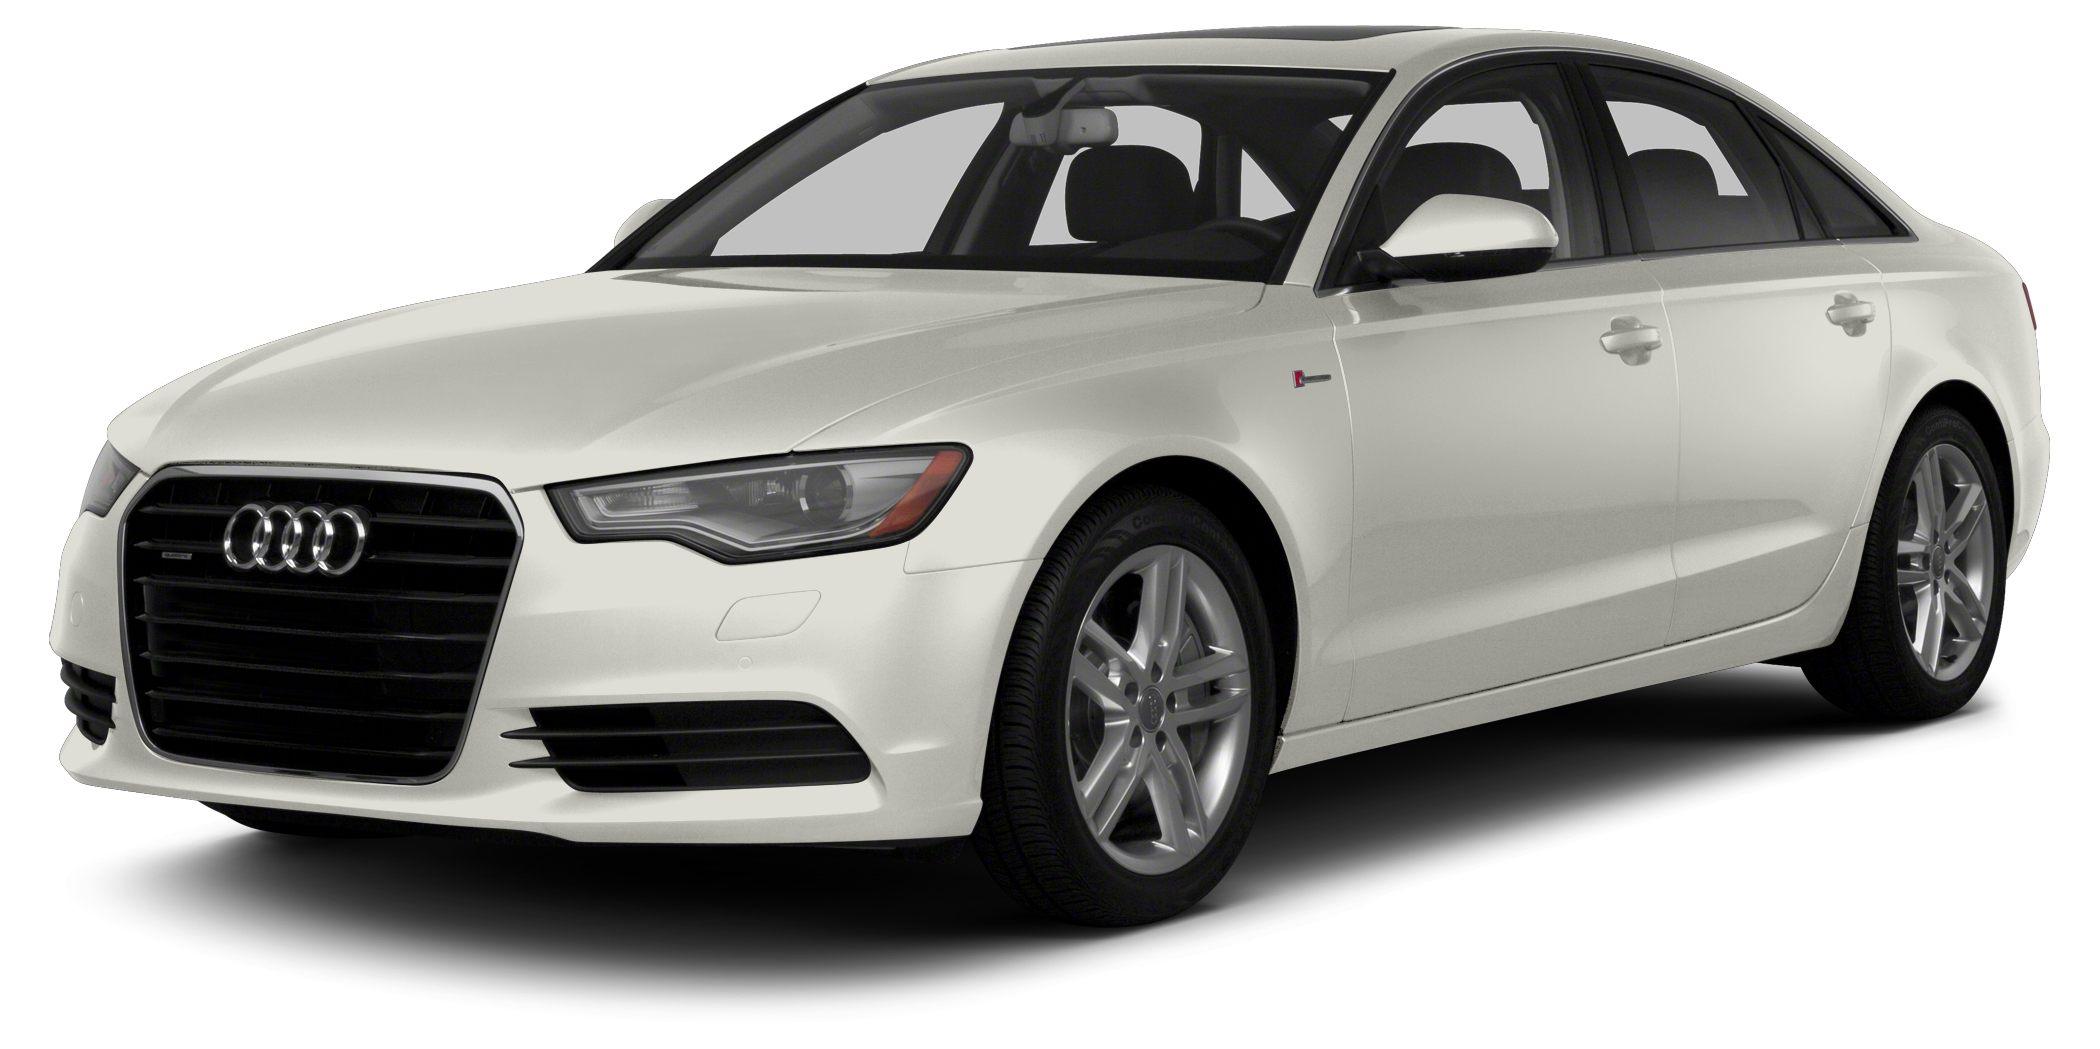 2013 Audi A6 30T quattro Premium QUATTRO BACKUP CAMERA NAVIGATION BLIND SPOT MONITIOR REMOTE